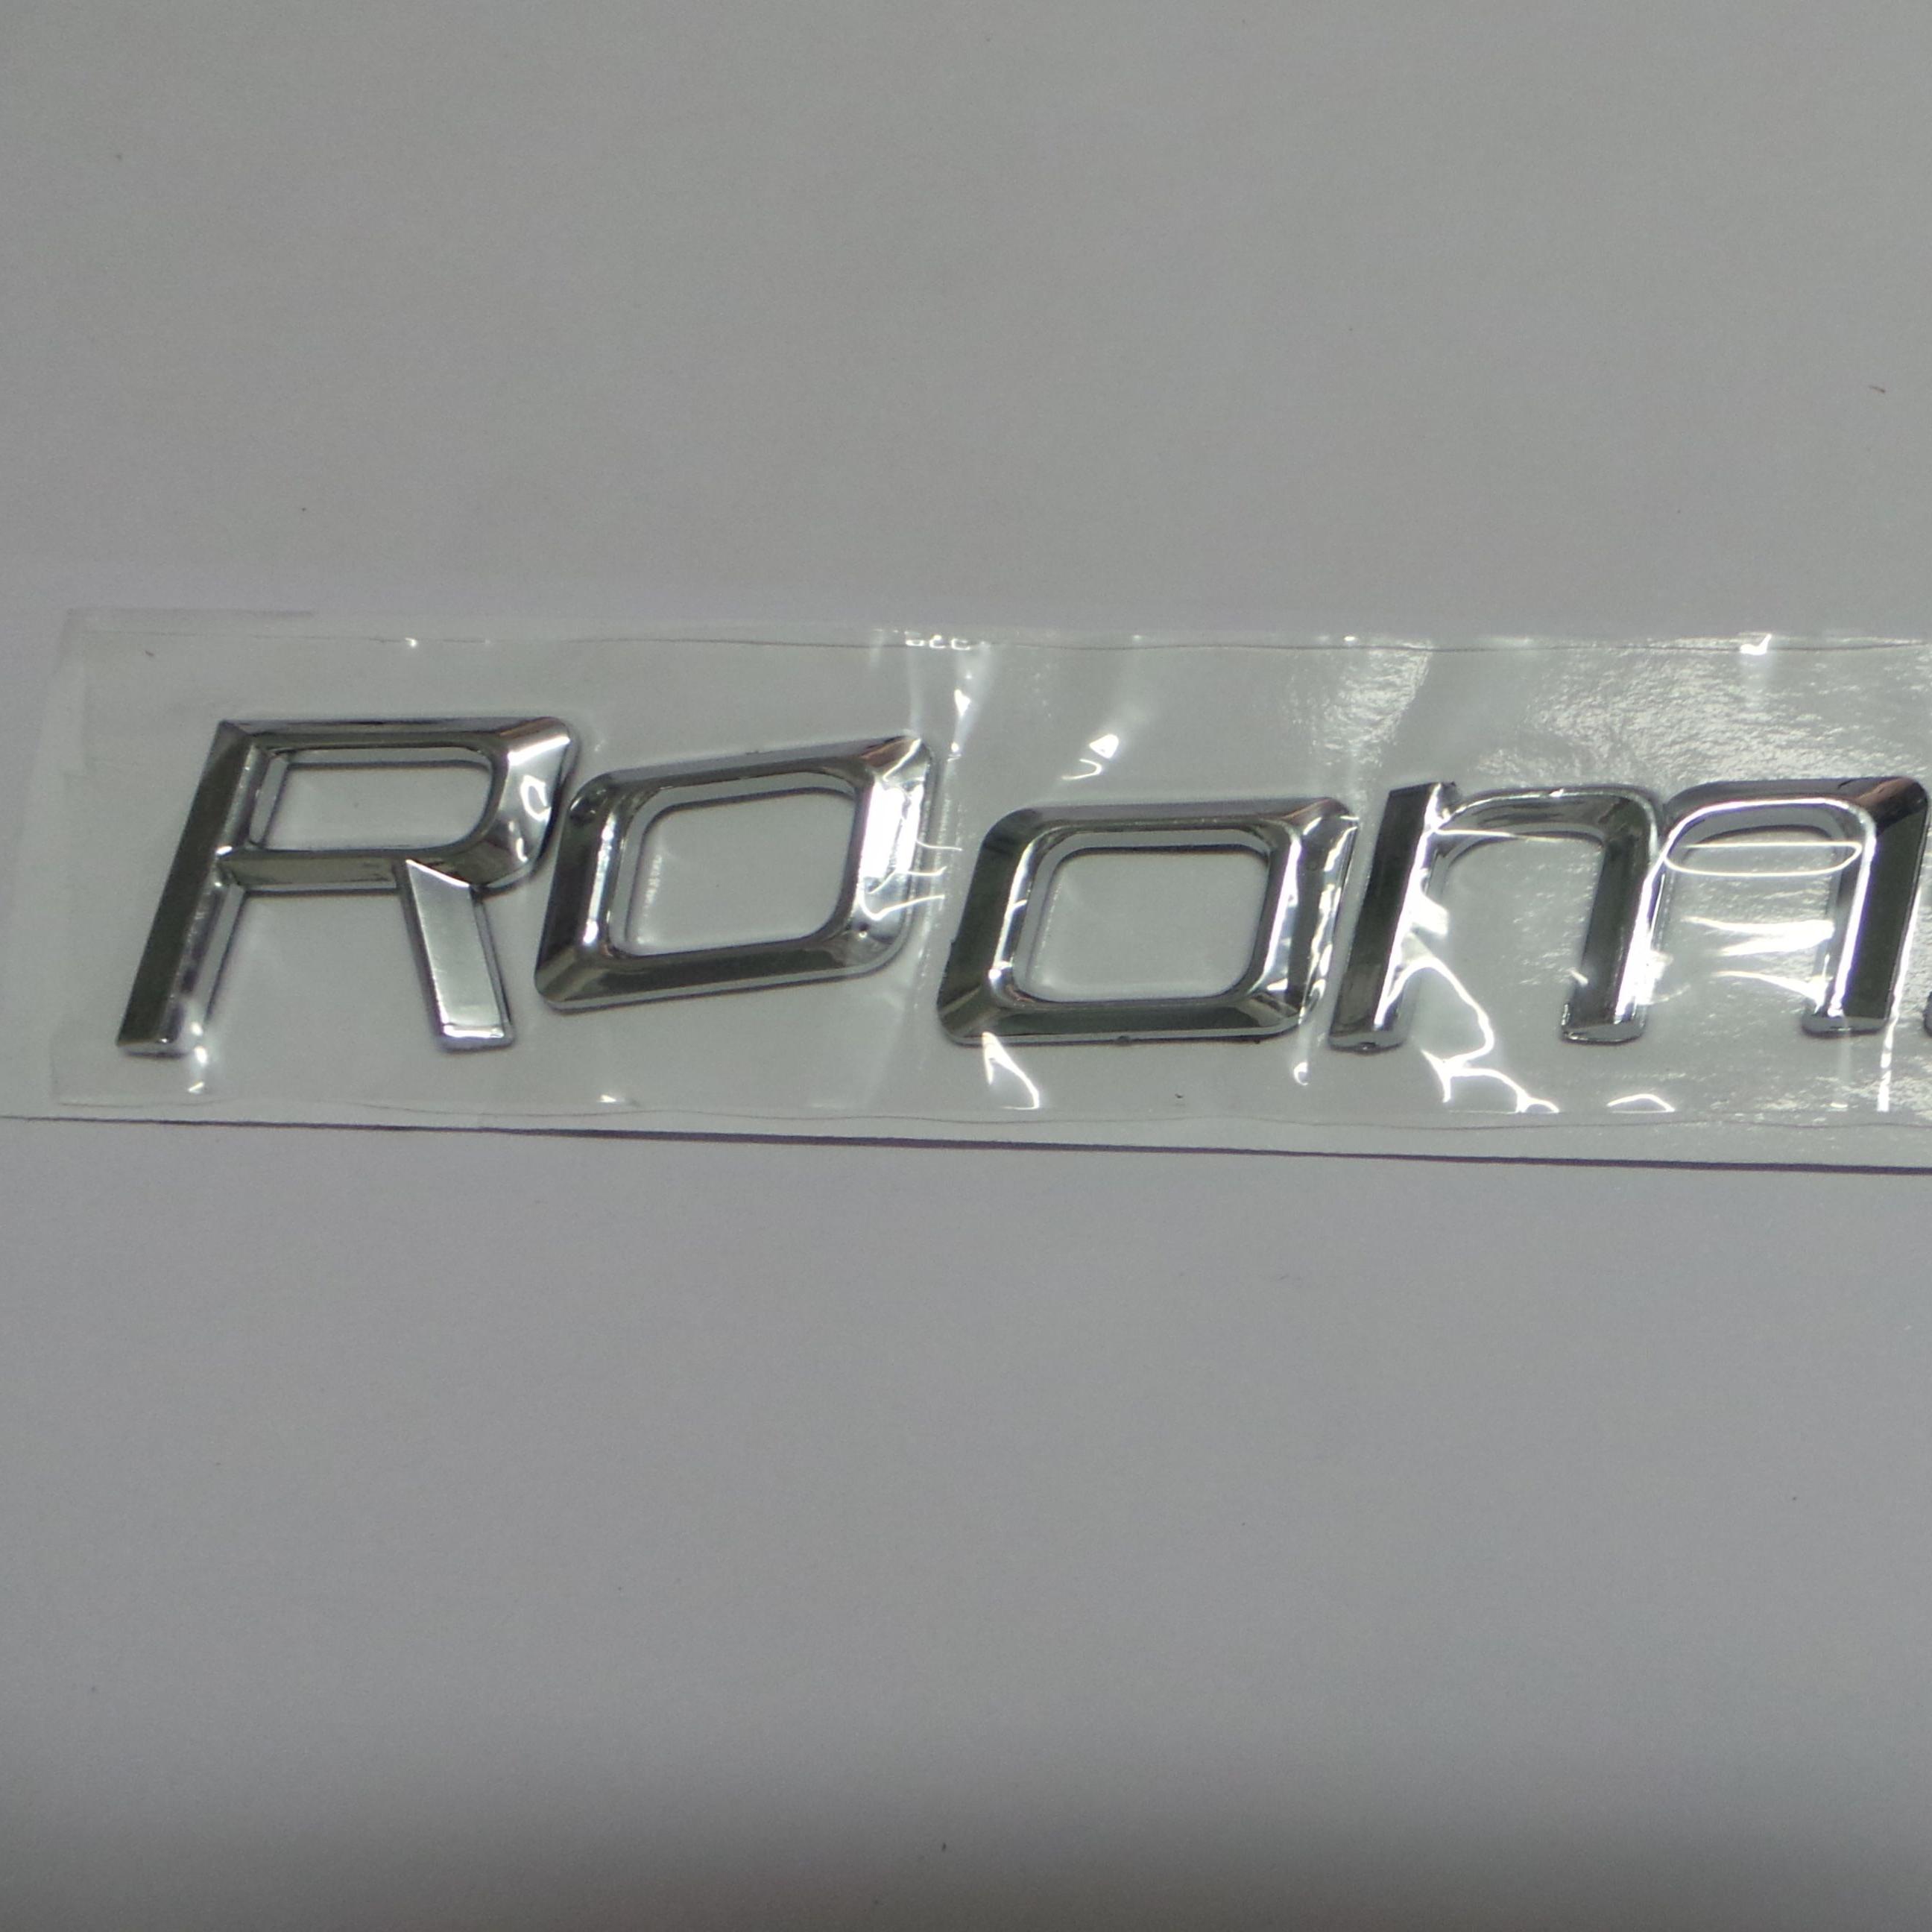 Chevrolet Silverado Suburban Tahoe Set-3 Adhesive Emblem Chrome 3D Letter LTZ